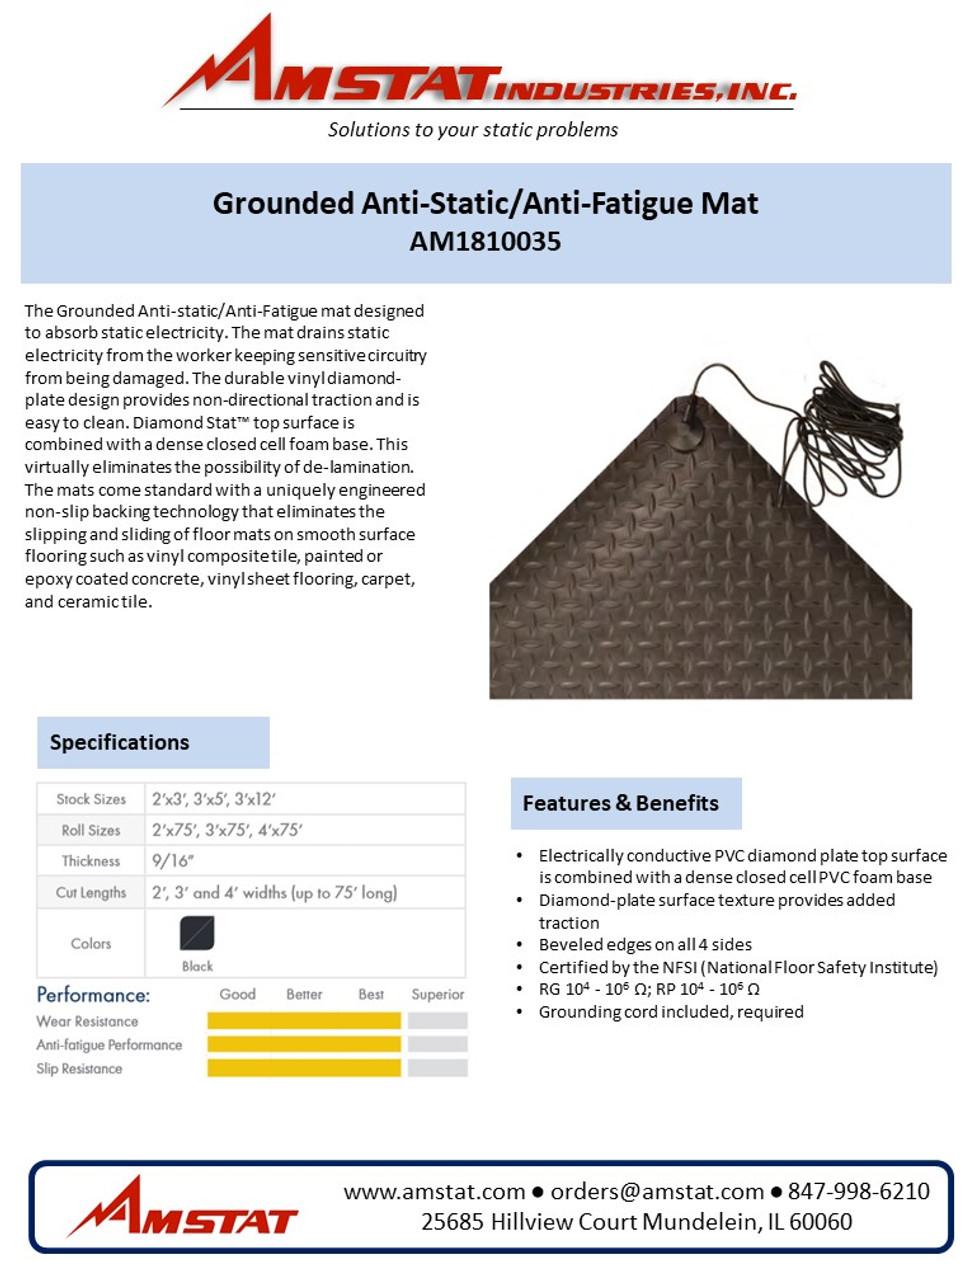 Grounded Anti-Static/Anti-Fatigue Matting